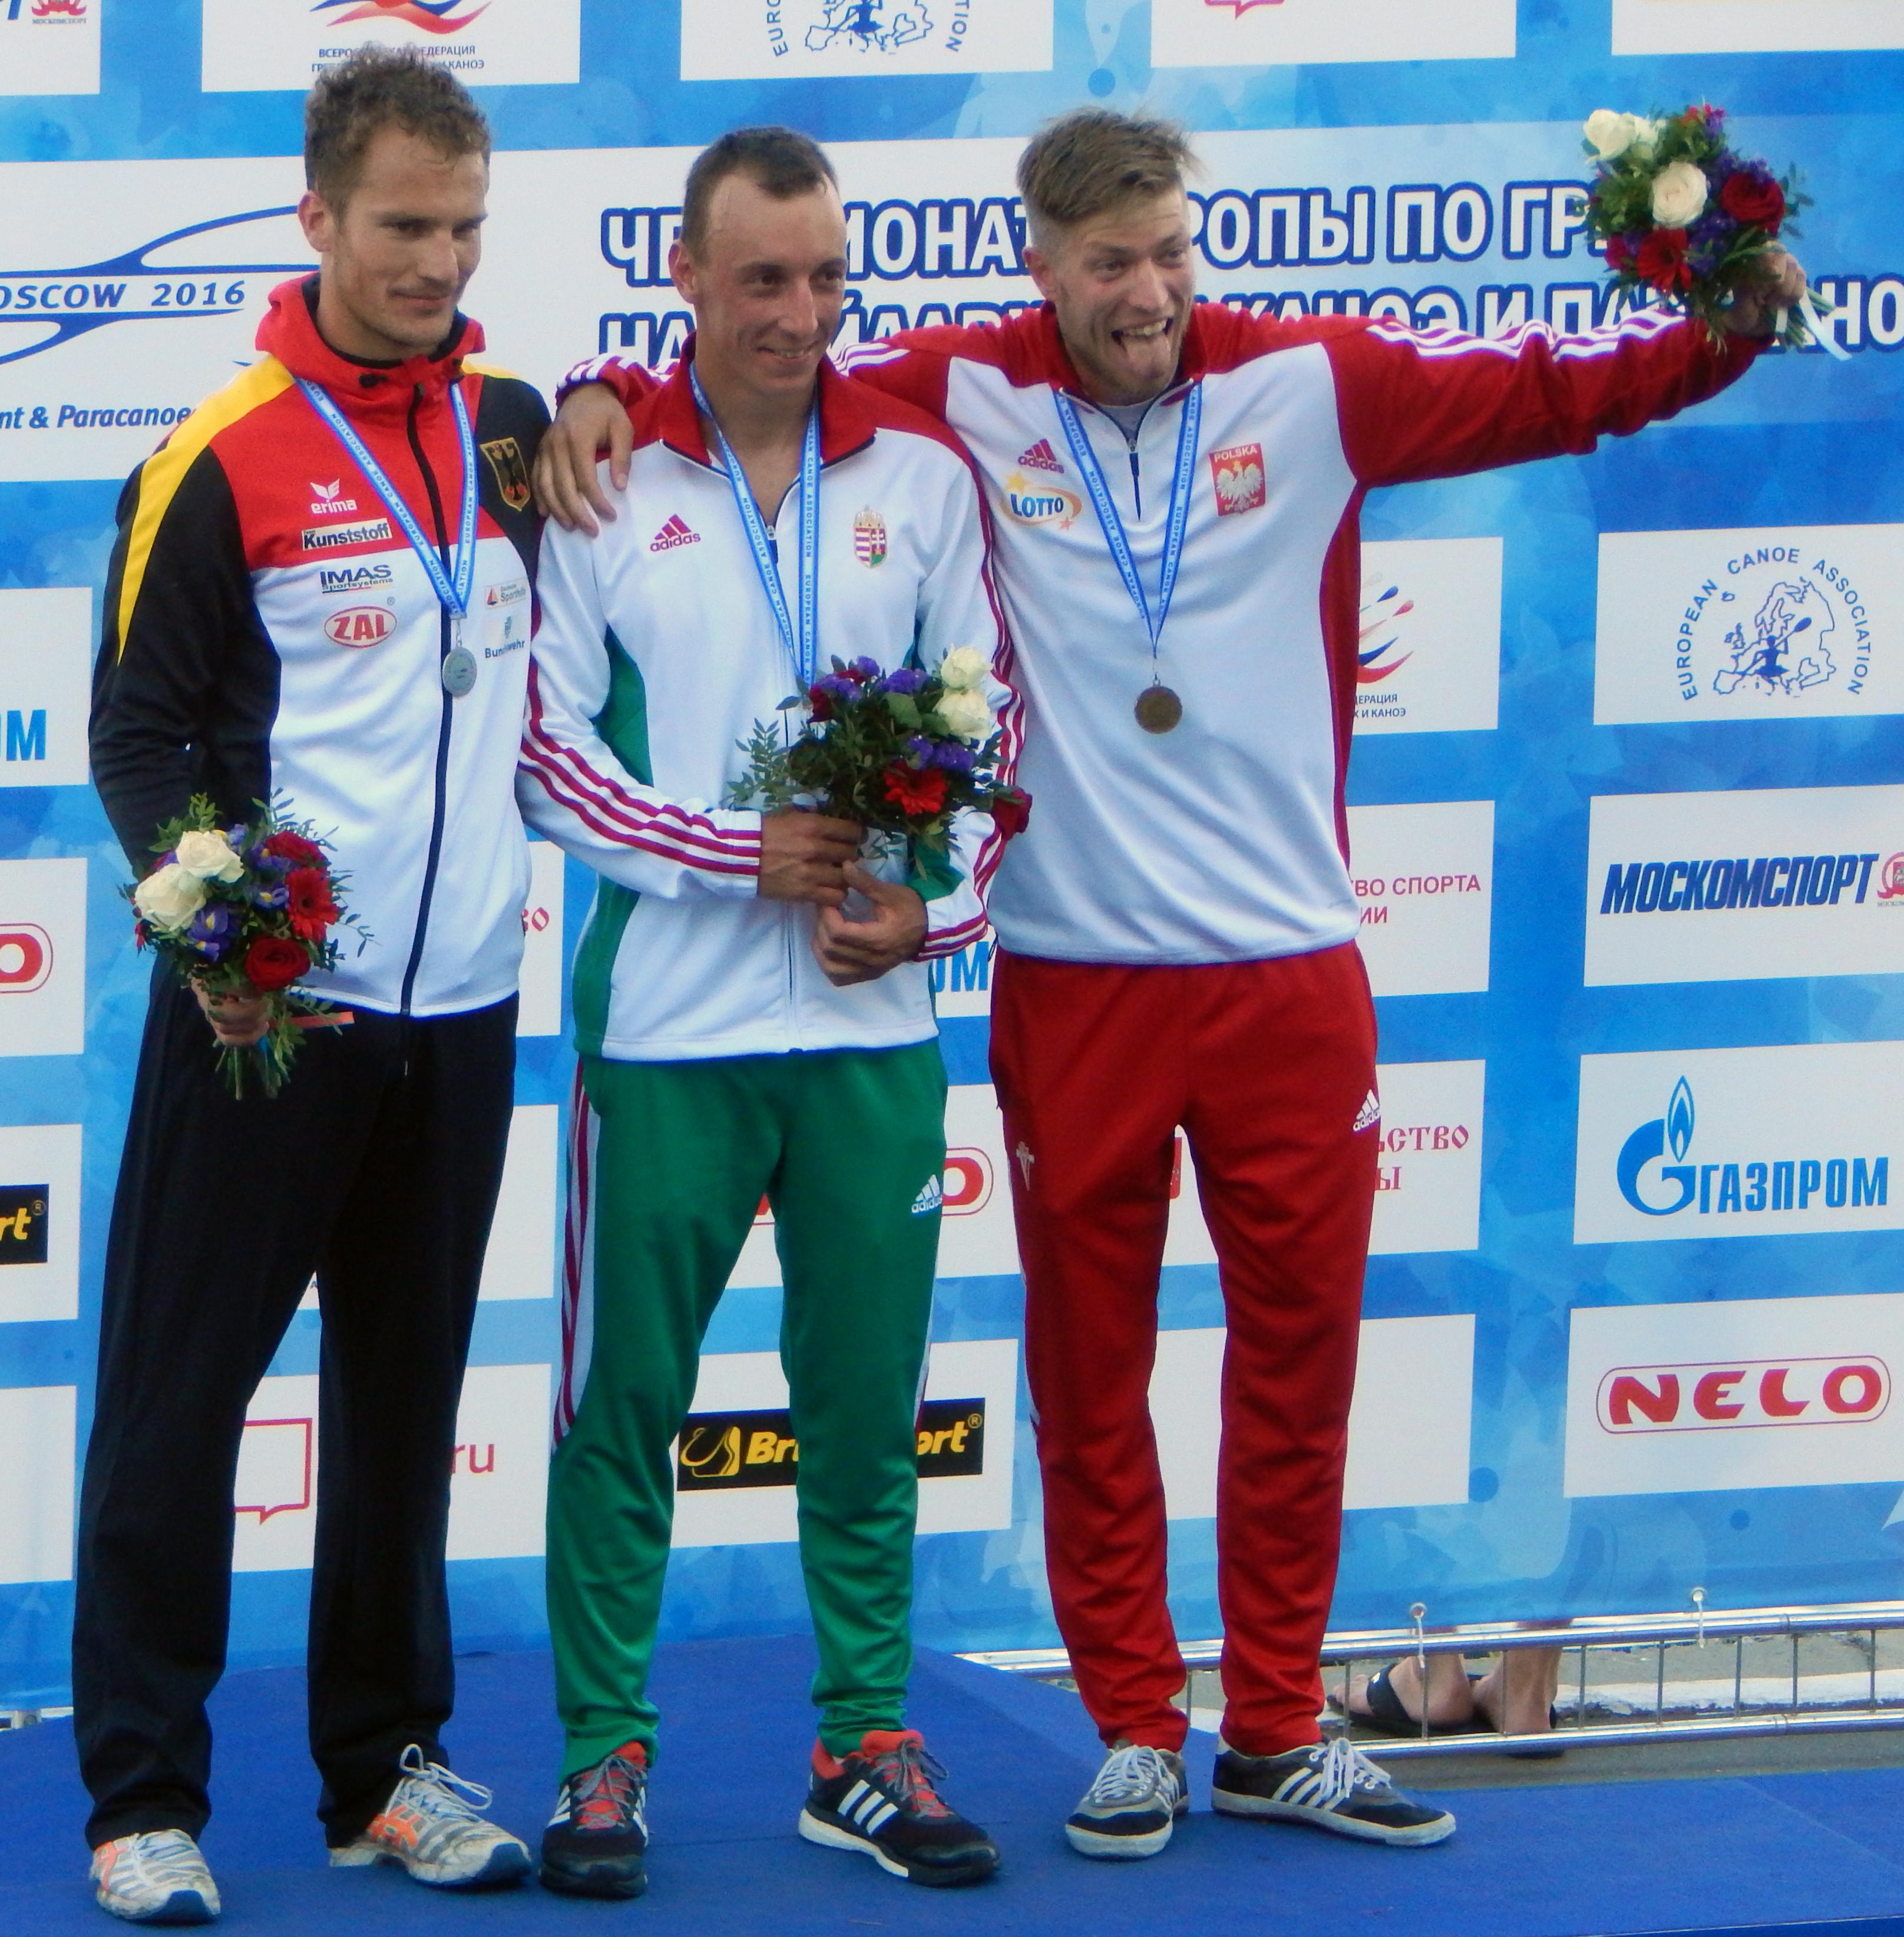 File:Canoe Moscow 2016 VC C1 Men 5000m.jpg Wikimedia